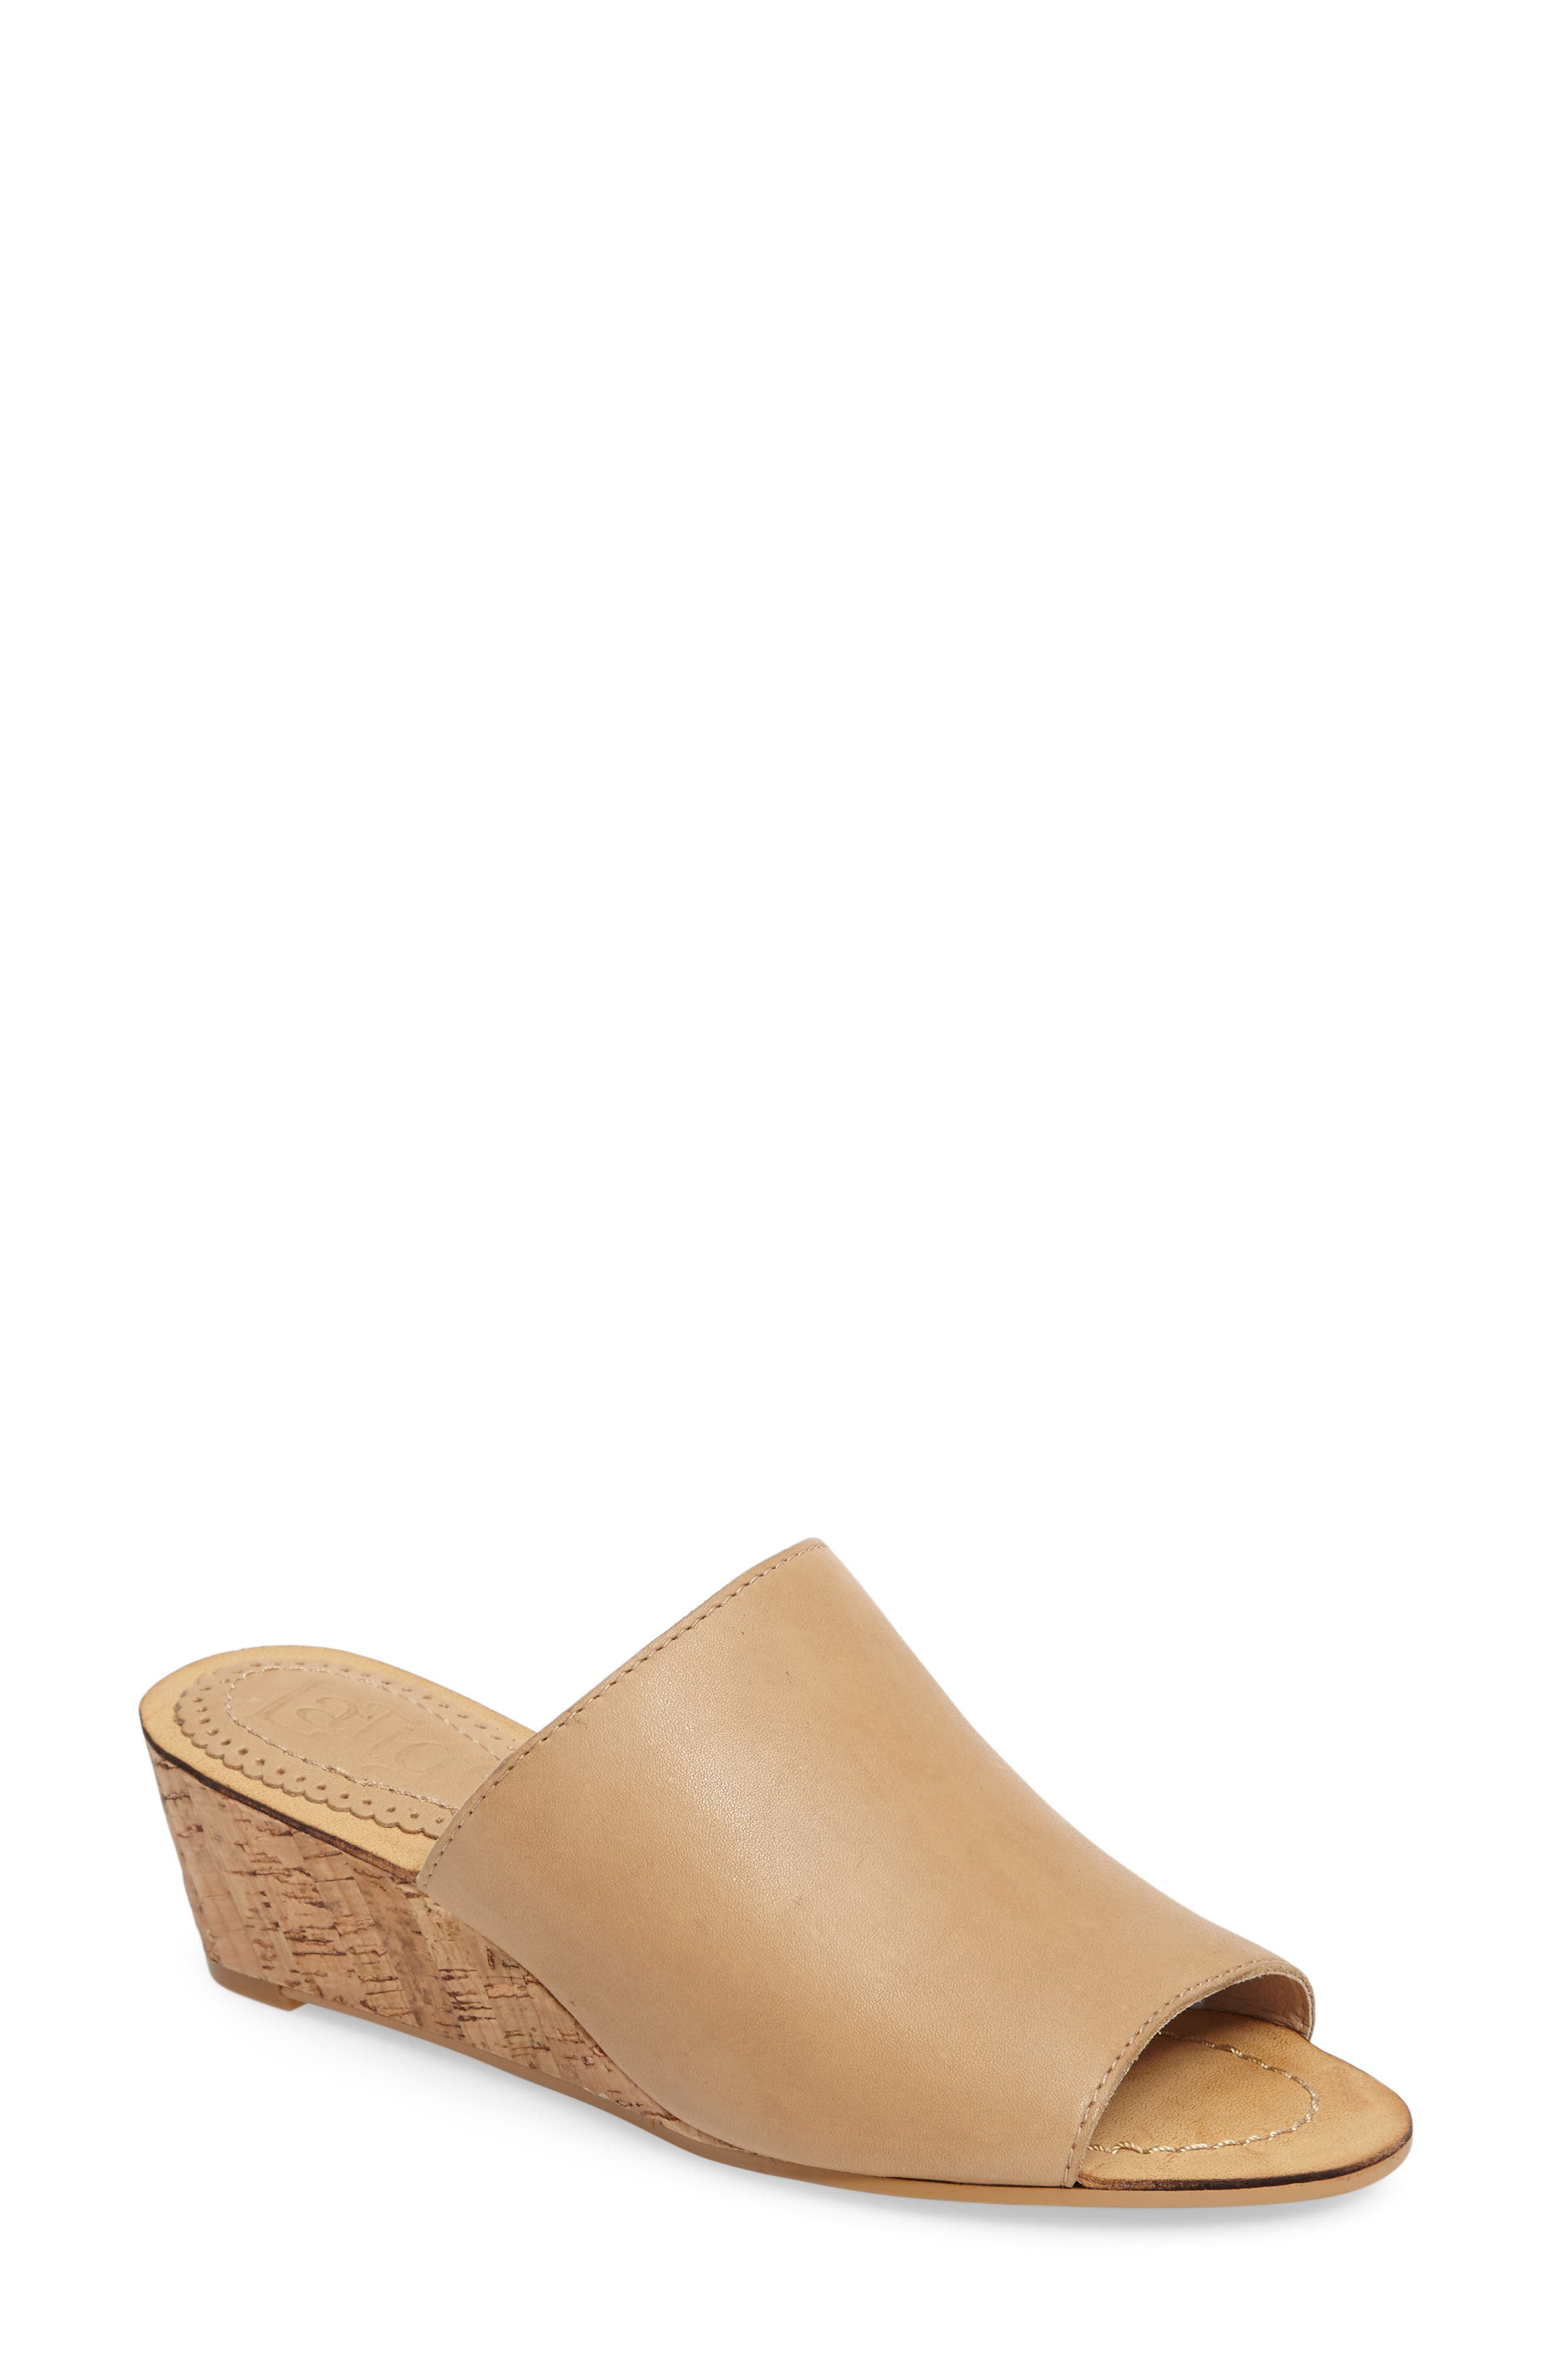 LATIGO Wedge Sandal